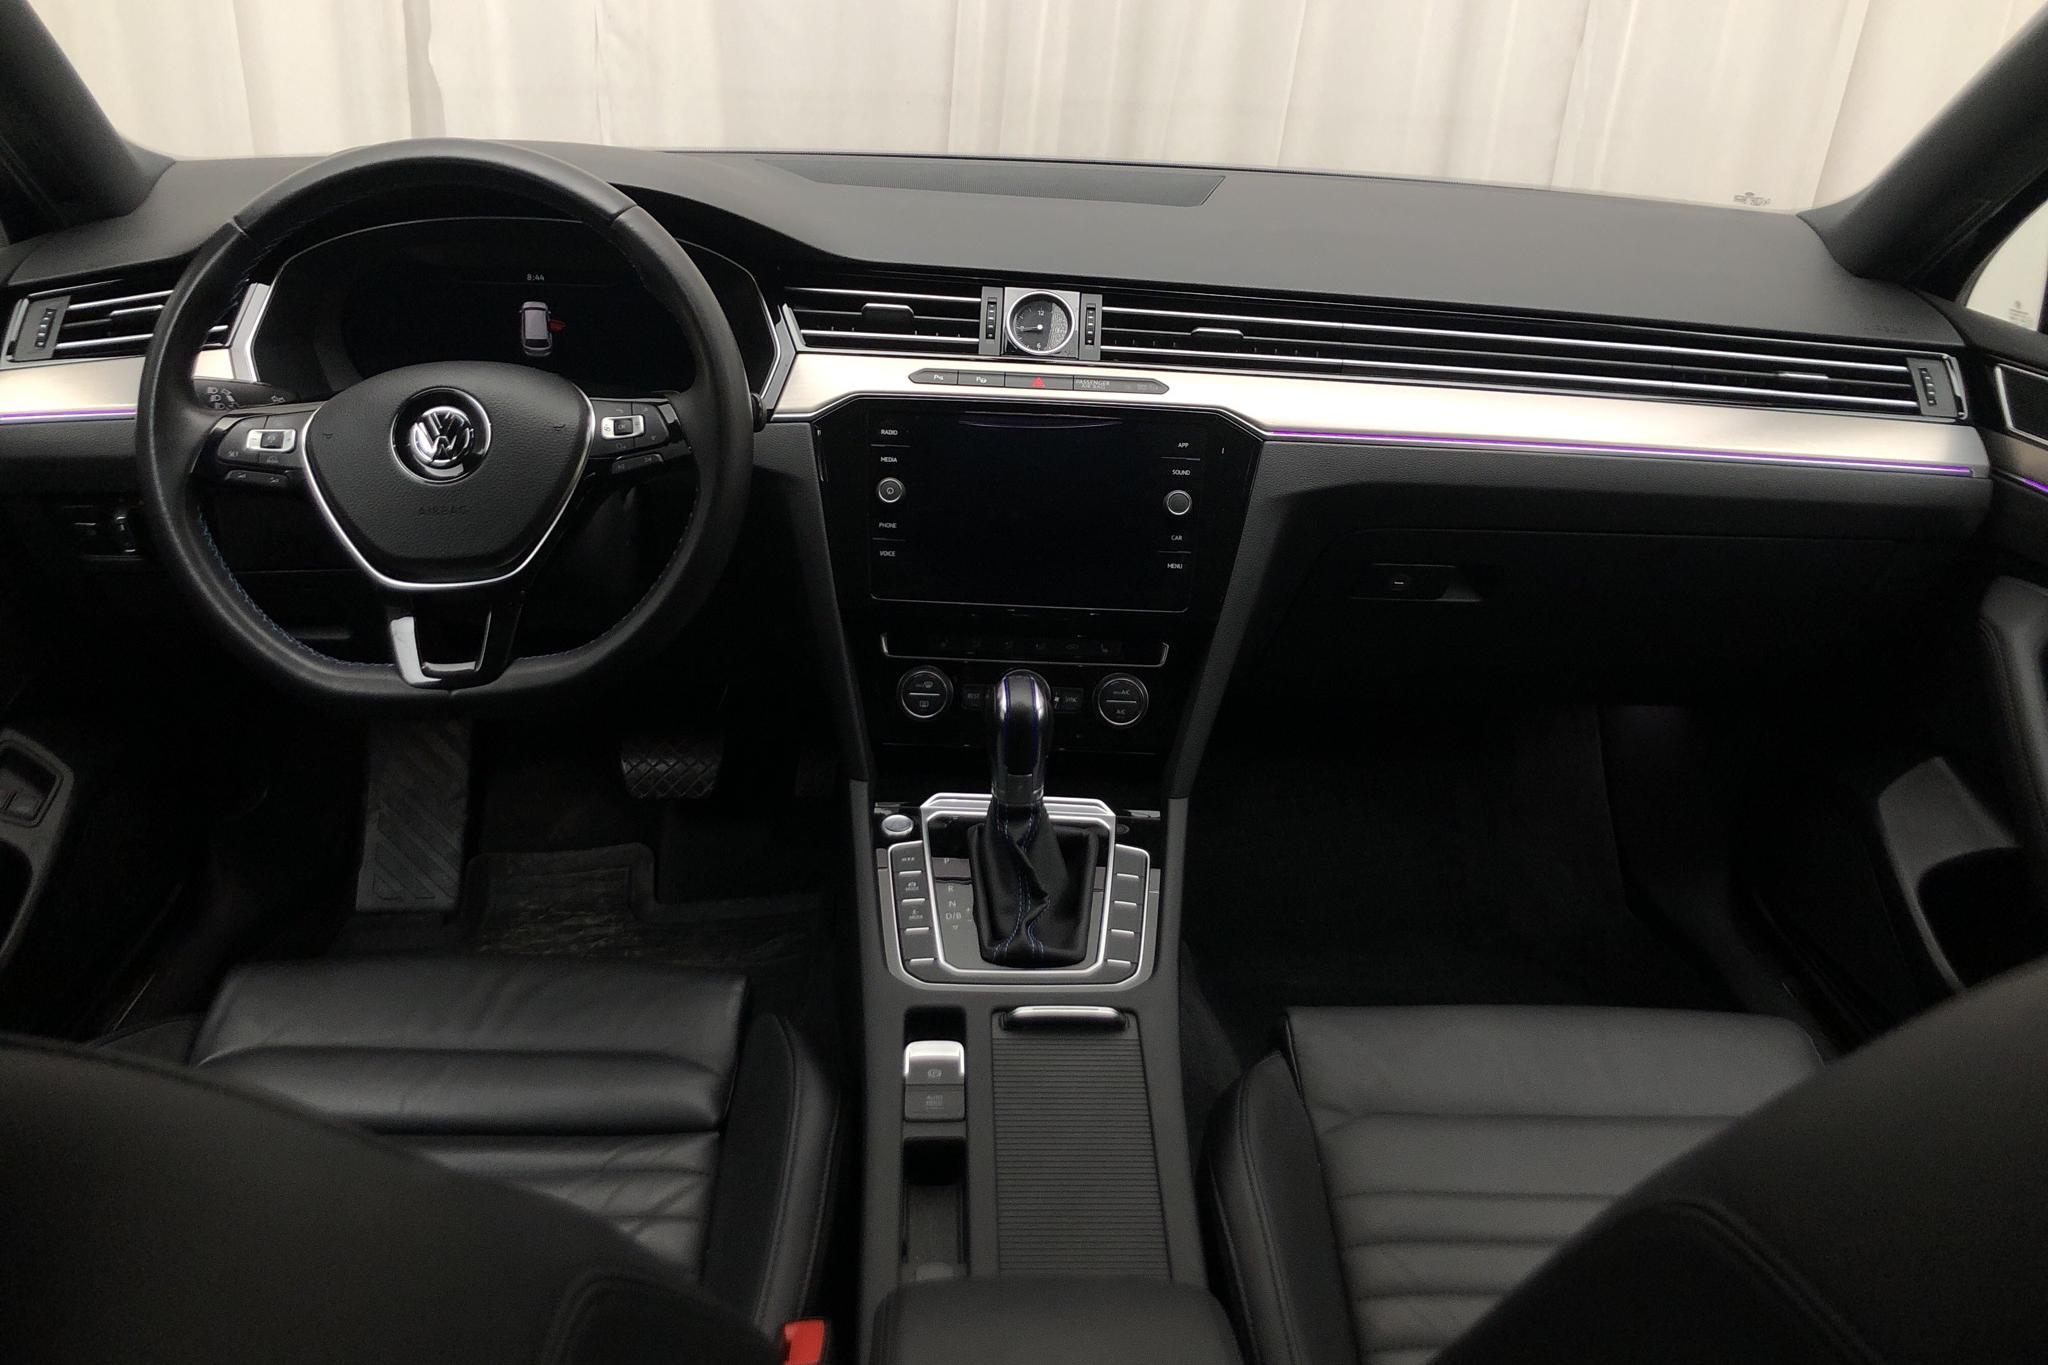 VW Passat 1.4 Plug-in-Hybrid Sportscombi (218hk) - 94 660 km - Automatic - Dark Blue - 2018